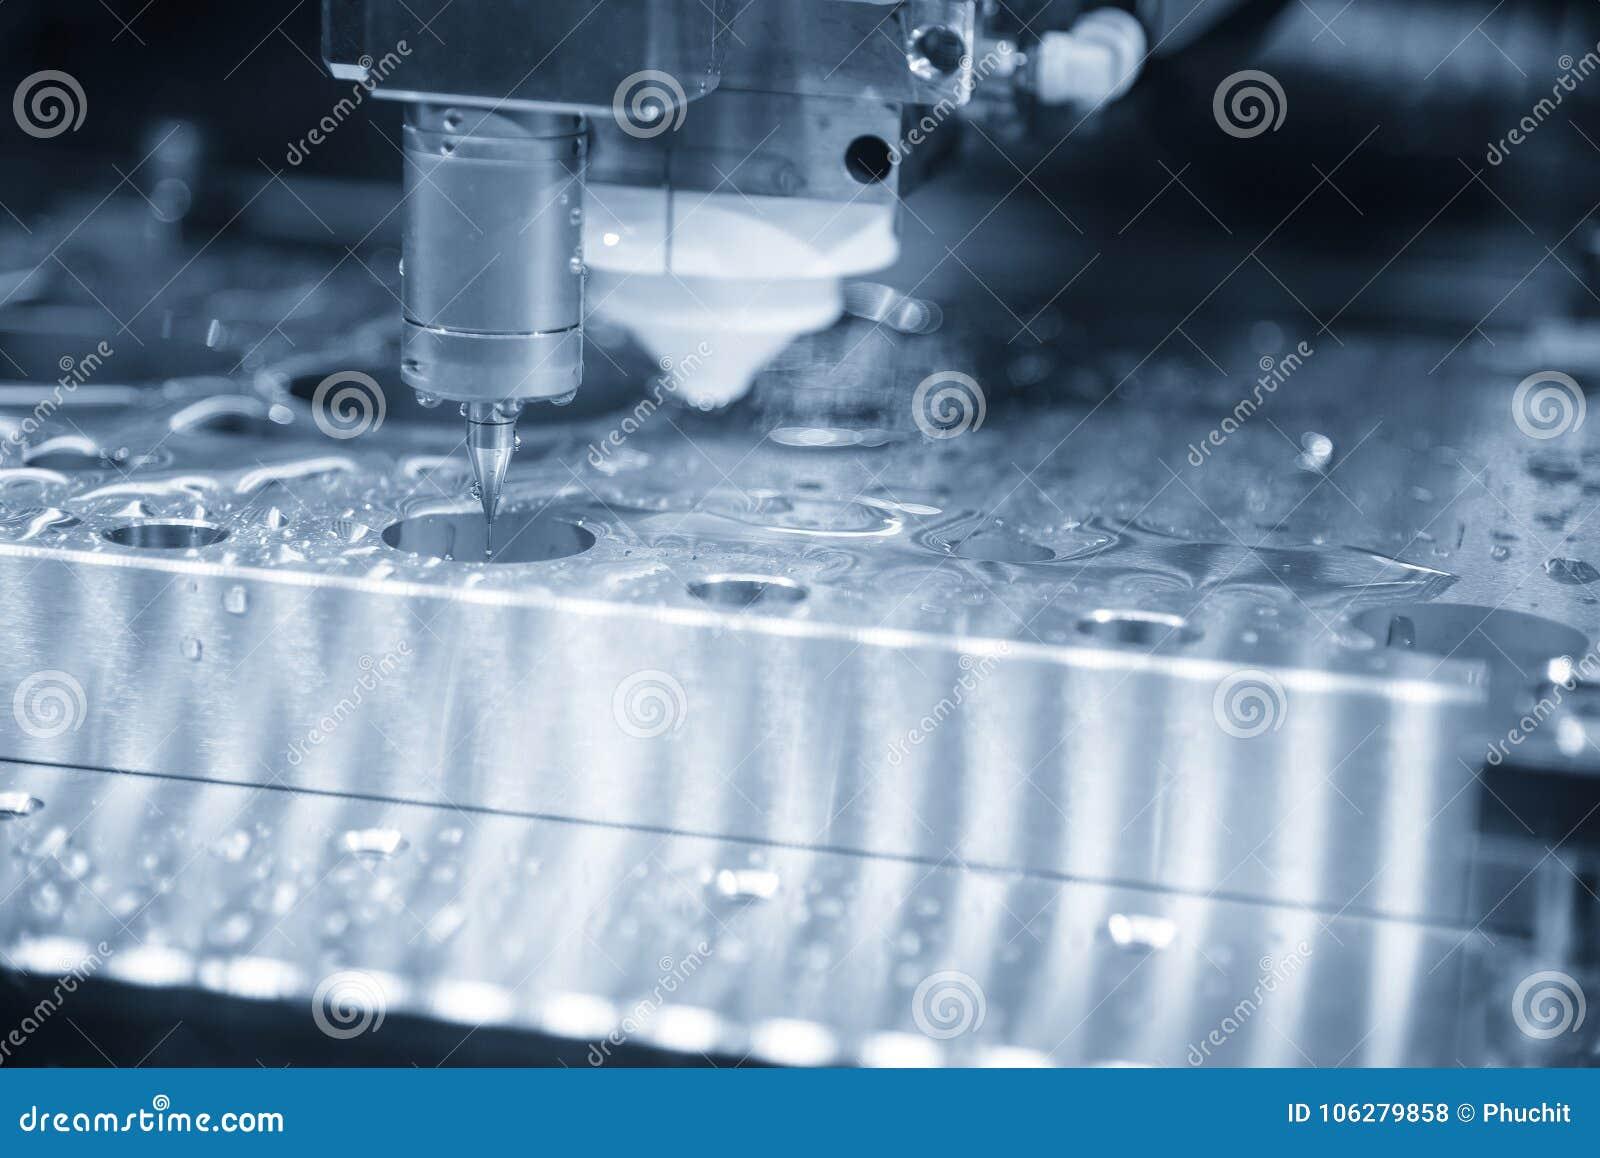 The Measurement Probe Attach On The Wire-EDM Machine. Stock Photo ...